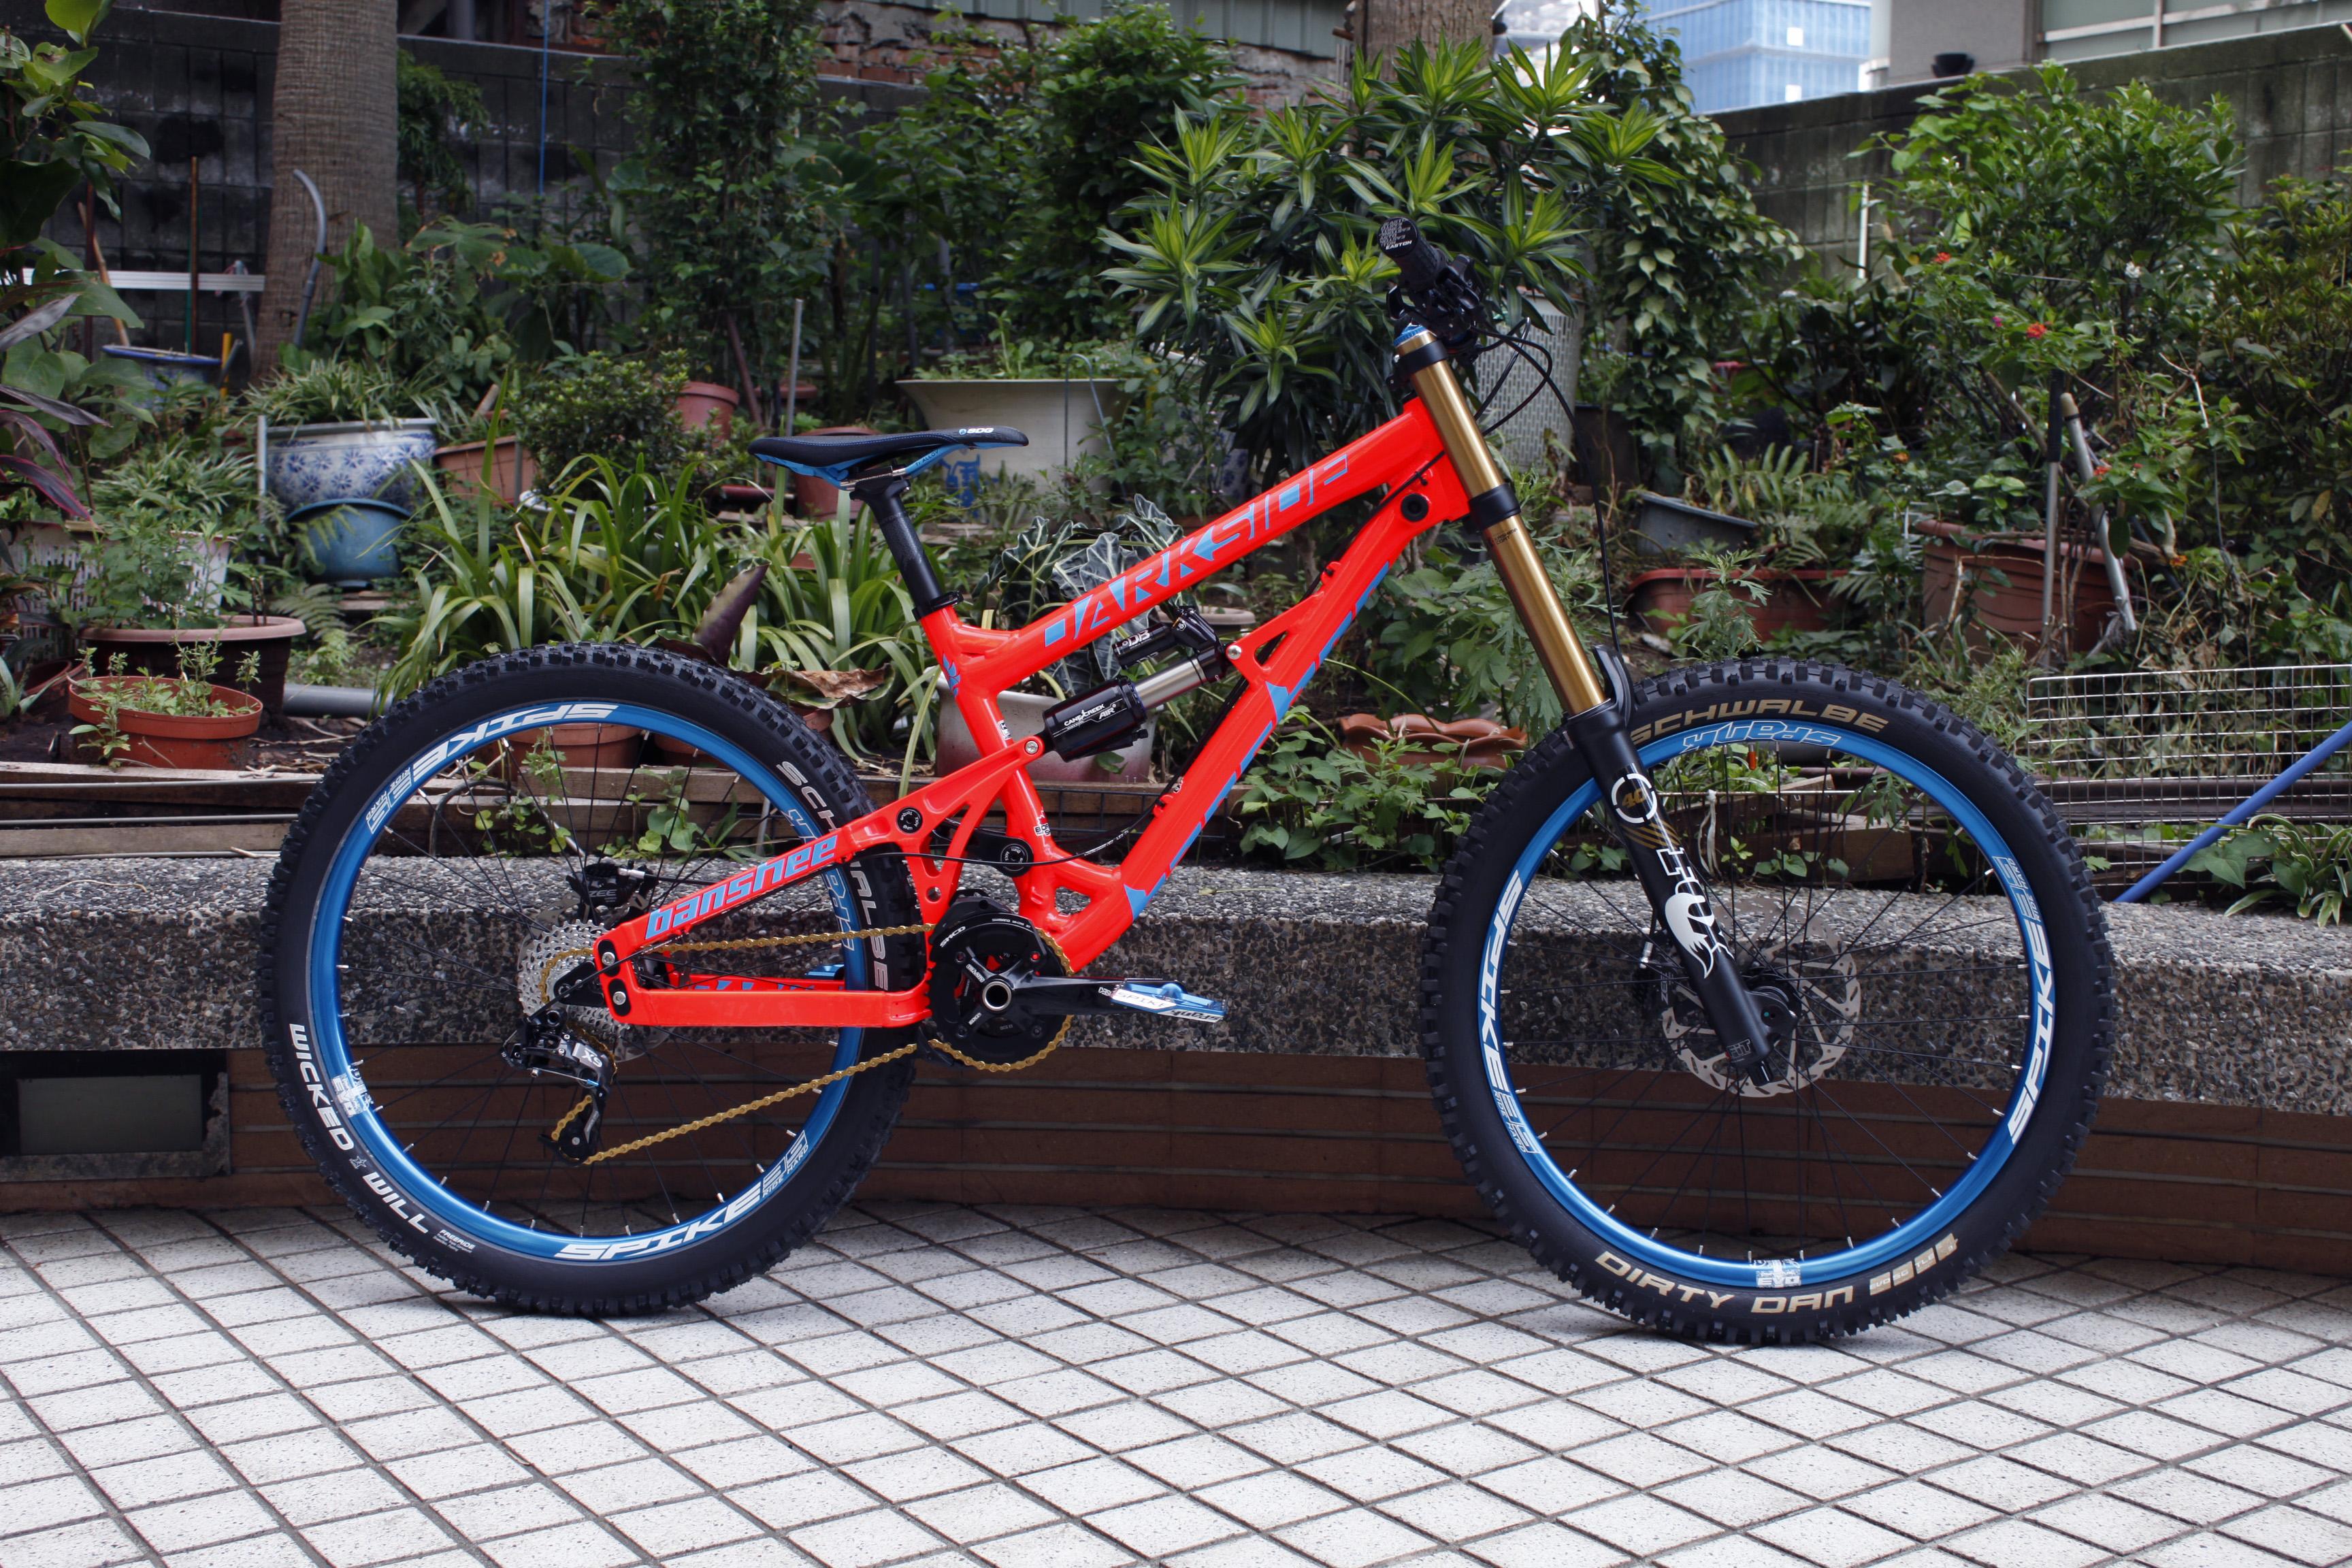 Drag Racing Helmets >> Banshee Darkside (Neon Orange+Blue) - dirtybikes's Bike Check - Vital MTB